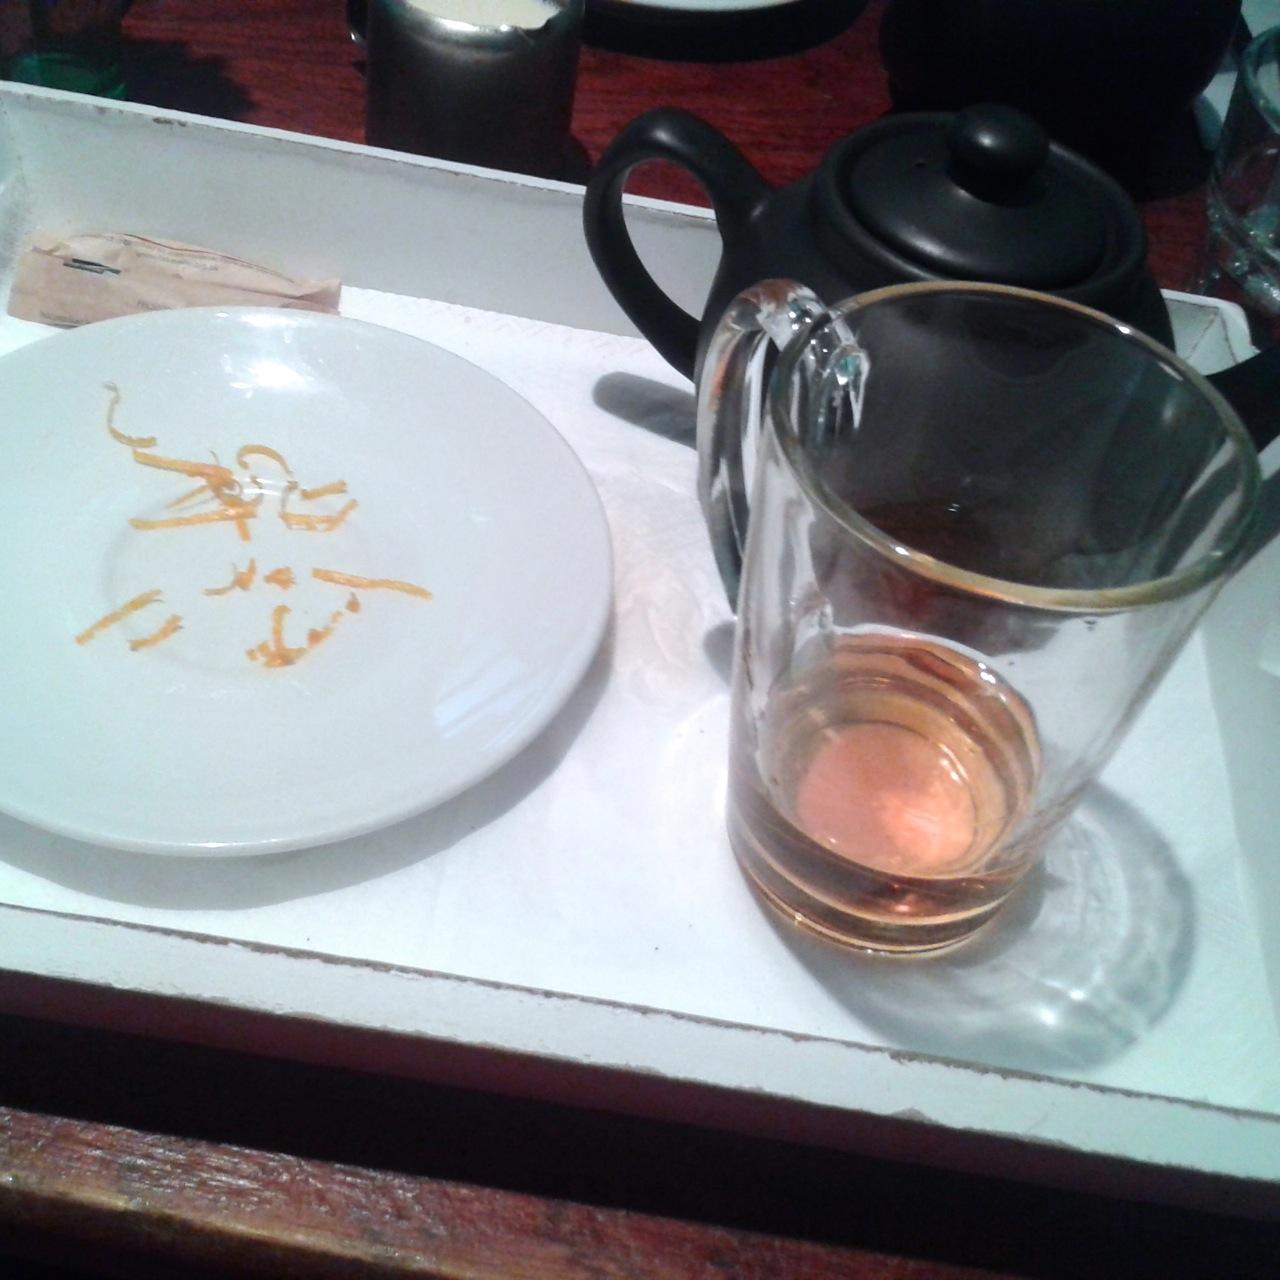 https://i2.wp.com/fatgayvegan.com/wp-content/uploads/2014/12/smoked-whisky.jpg?fit=1280%2C1280&ssl=1